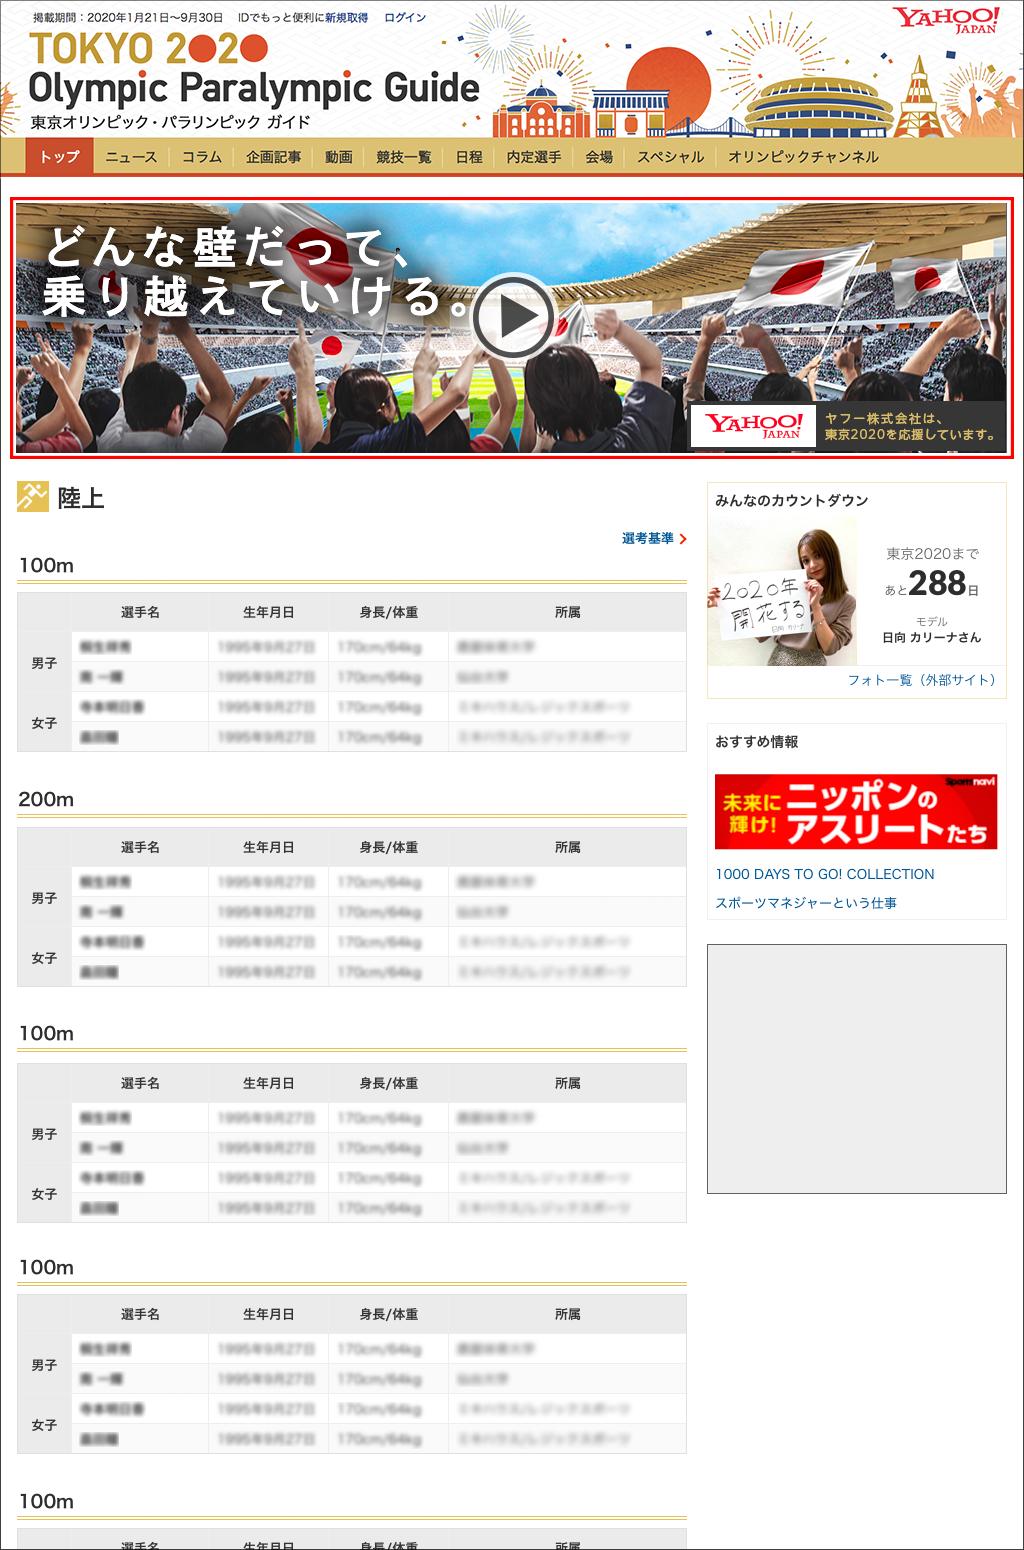 Yahoo! JAPAN 東京2020報道特集 パノラマ PC